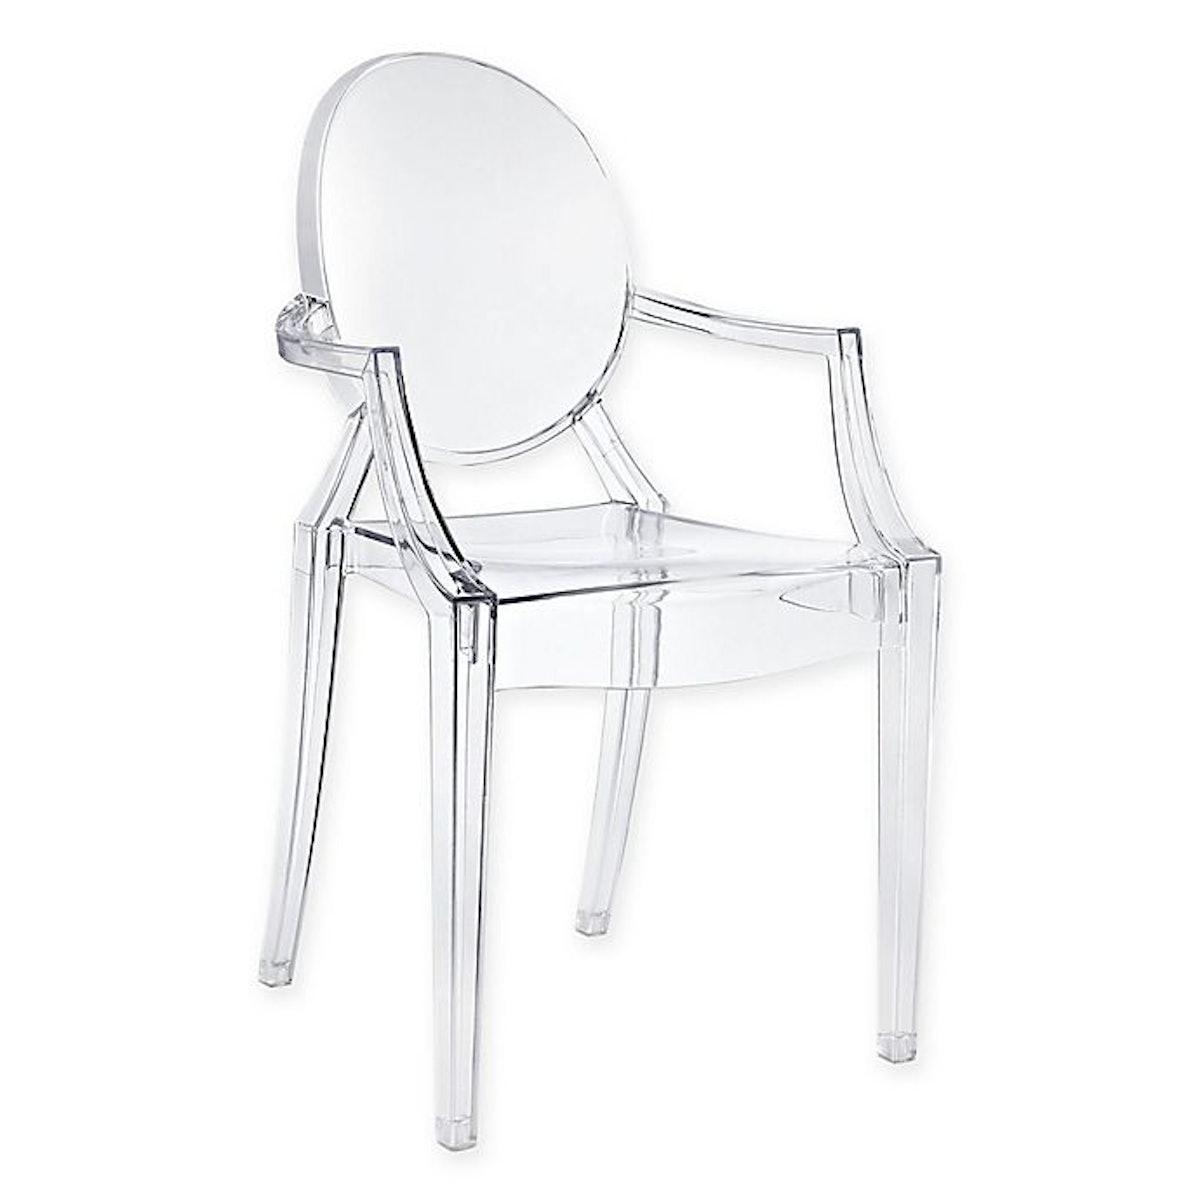 Casper Dining Arm Chair in Clear